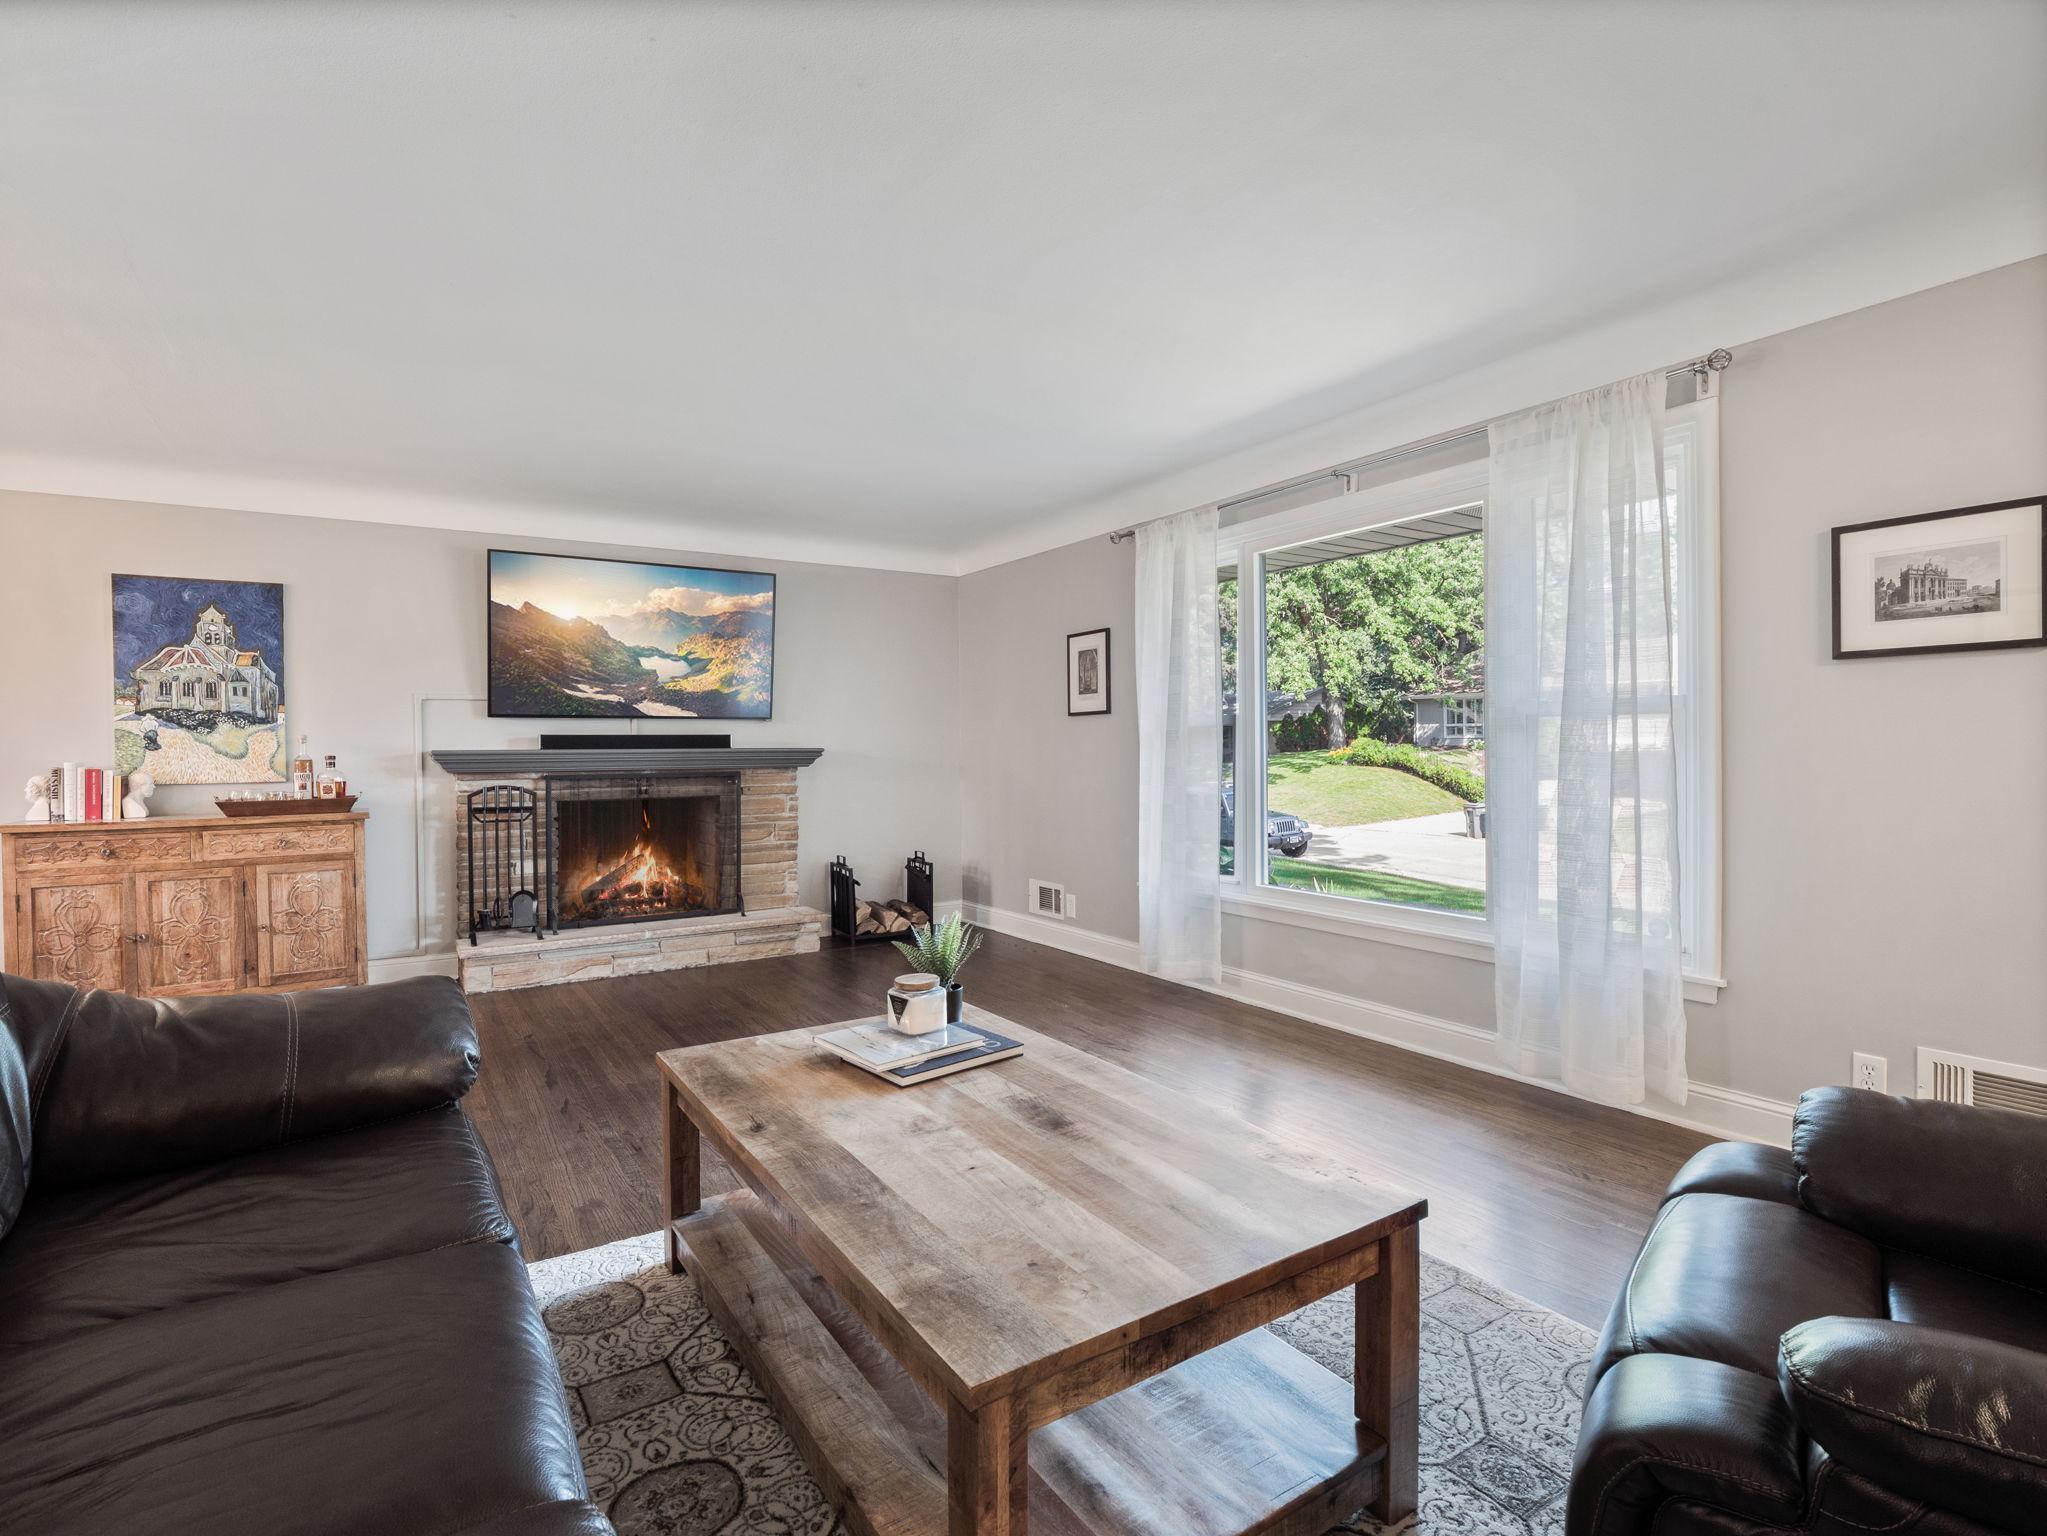 5133 Abercrombie Property Photo - Edina, MN real estate listing